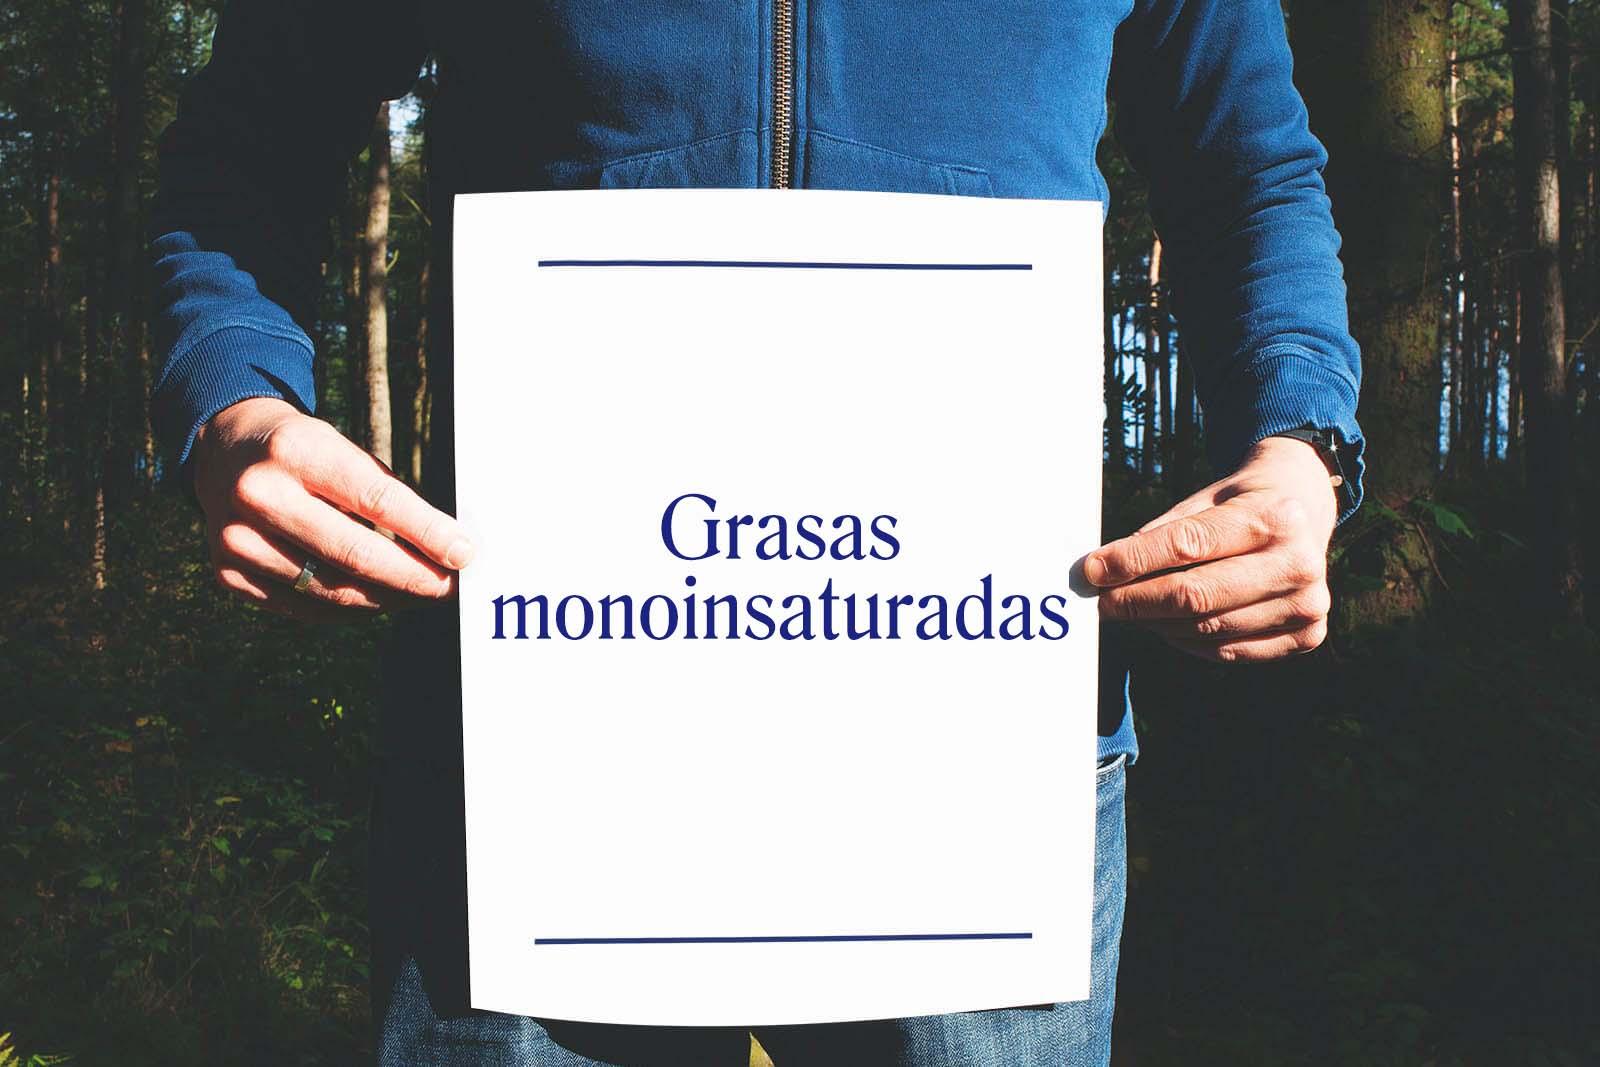 Grasas monoinsaturadas